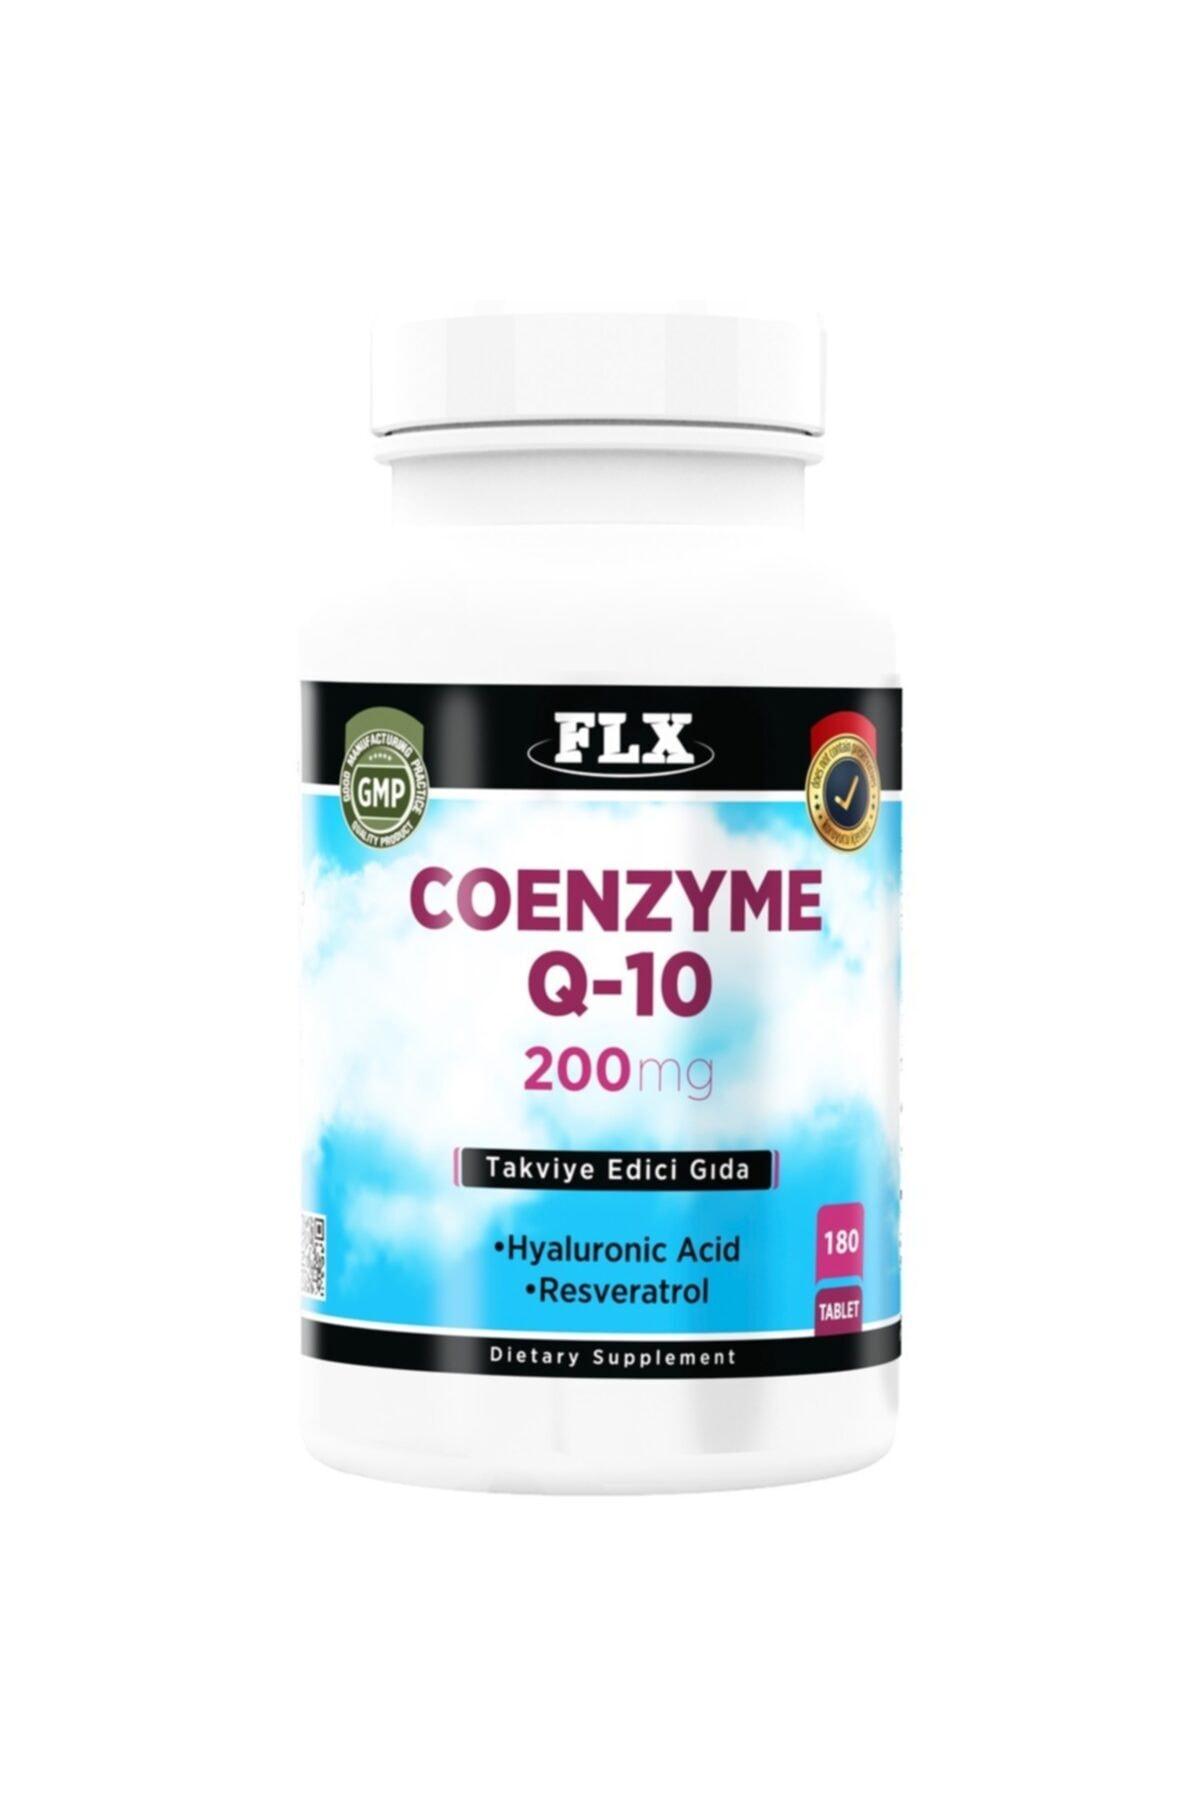 FLX Coenzyme Q-10 200 Mg Hyaluronik Asit 180 Tablet X 3 Kutu 2